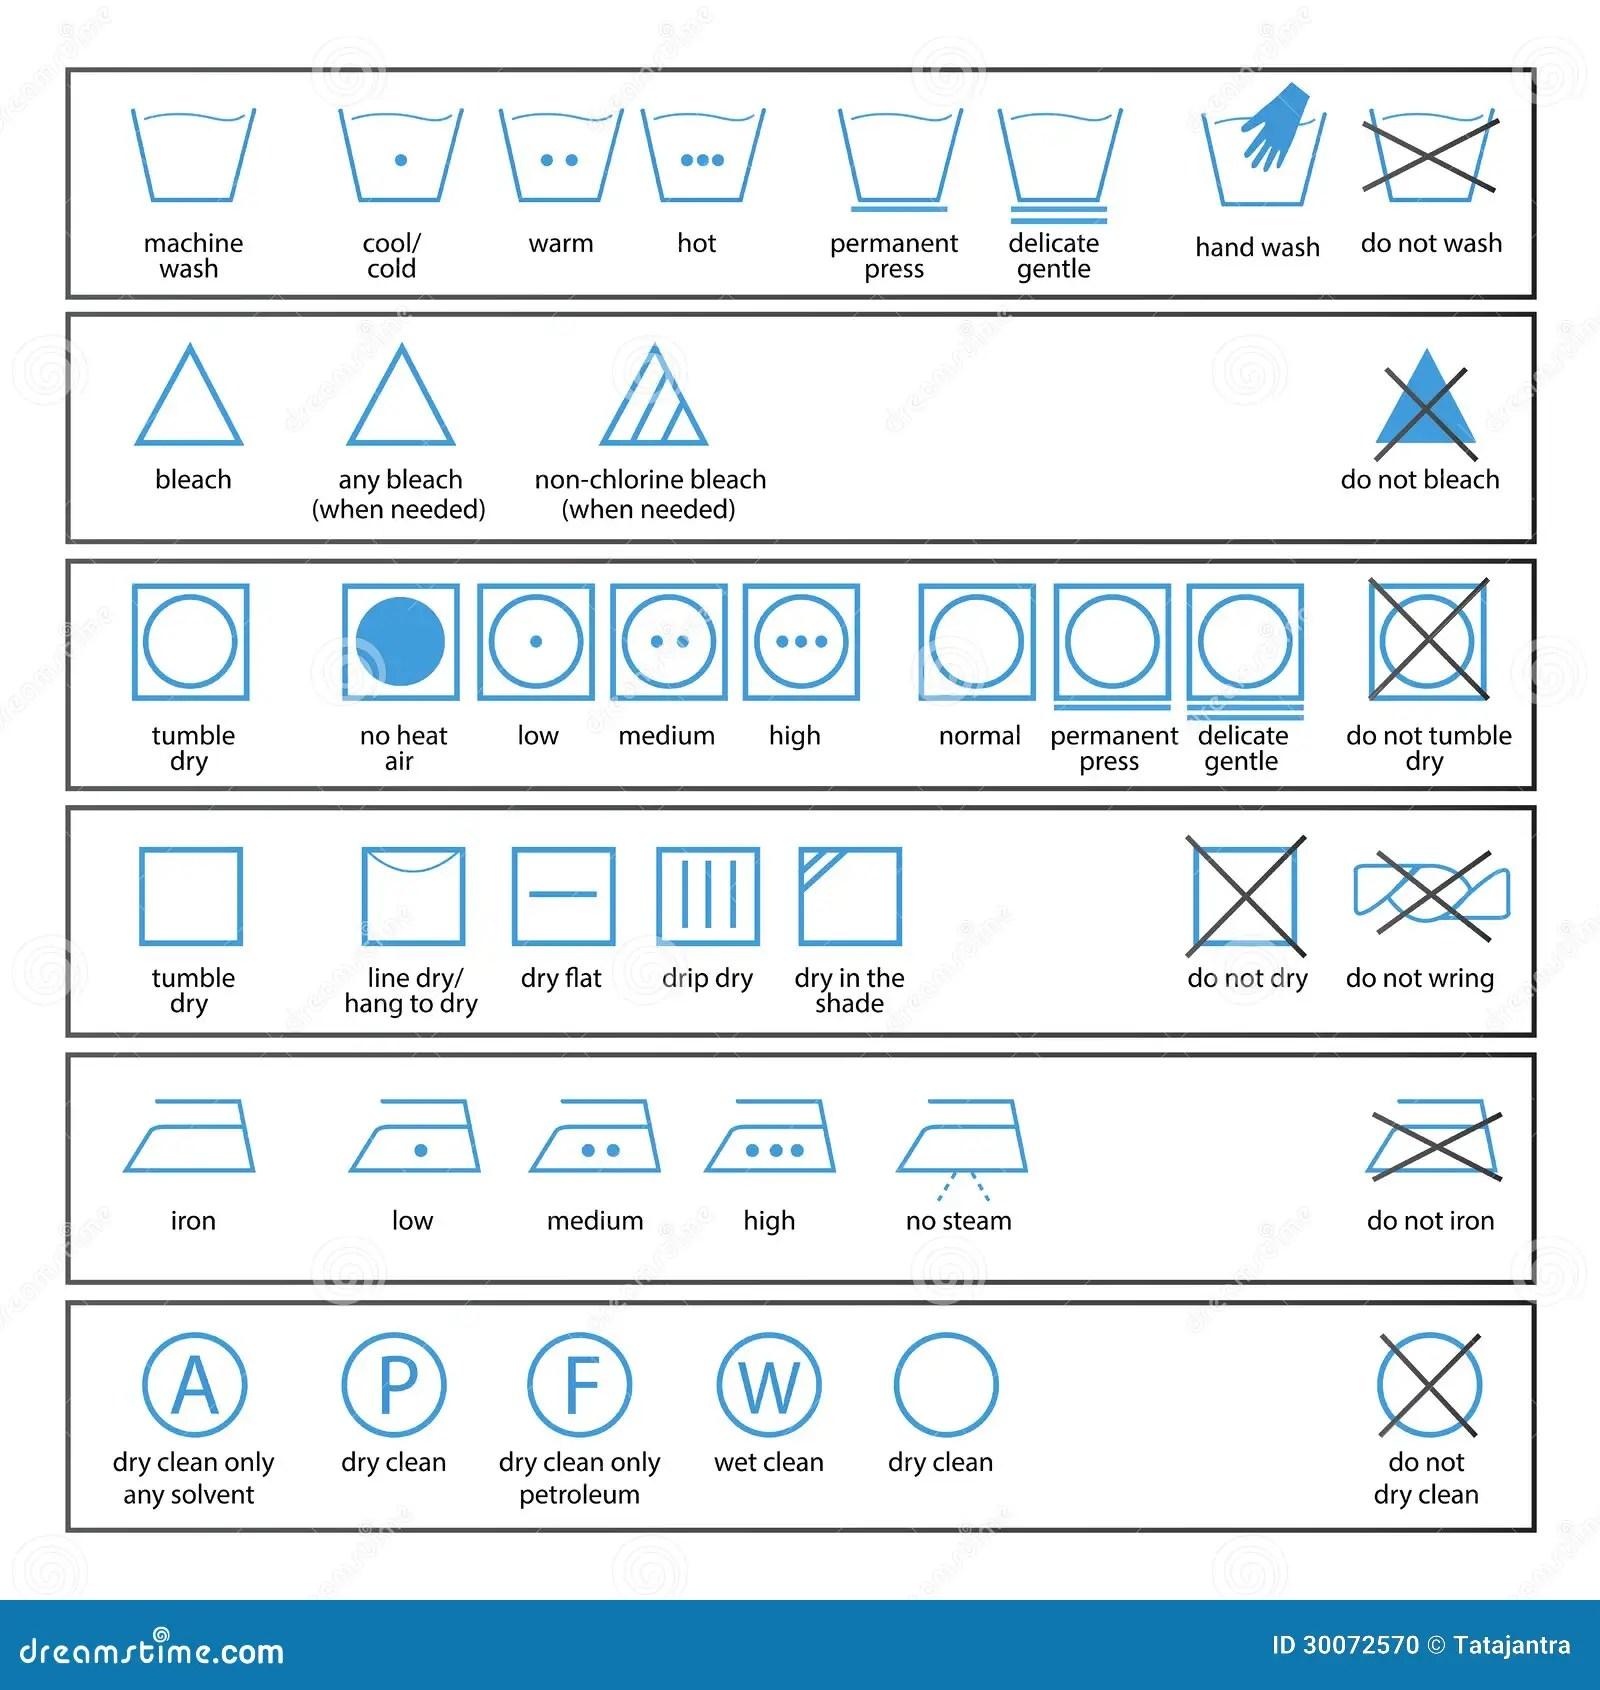 International washing symbols on clothing choice image symbol international washing symbols on clothing image collections washing symbols on clothing international washing symbols on clothing biocorpaavc